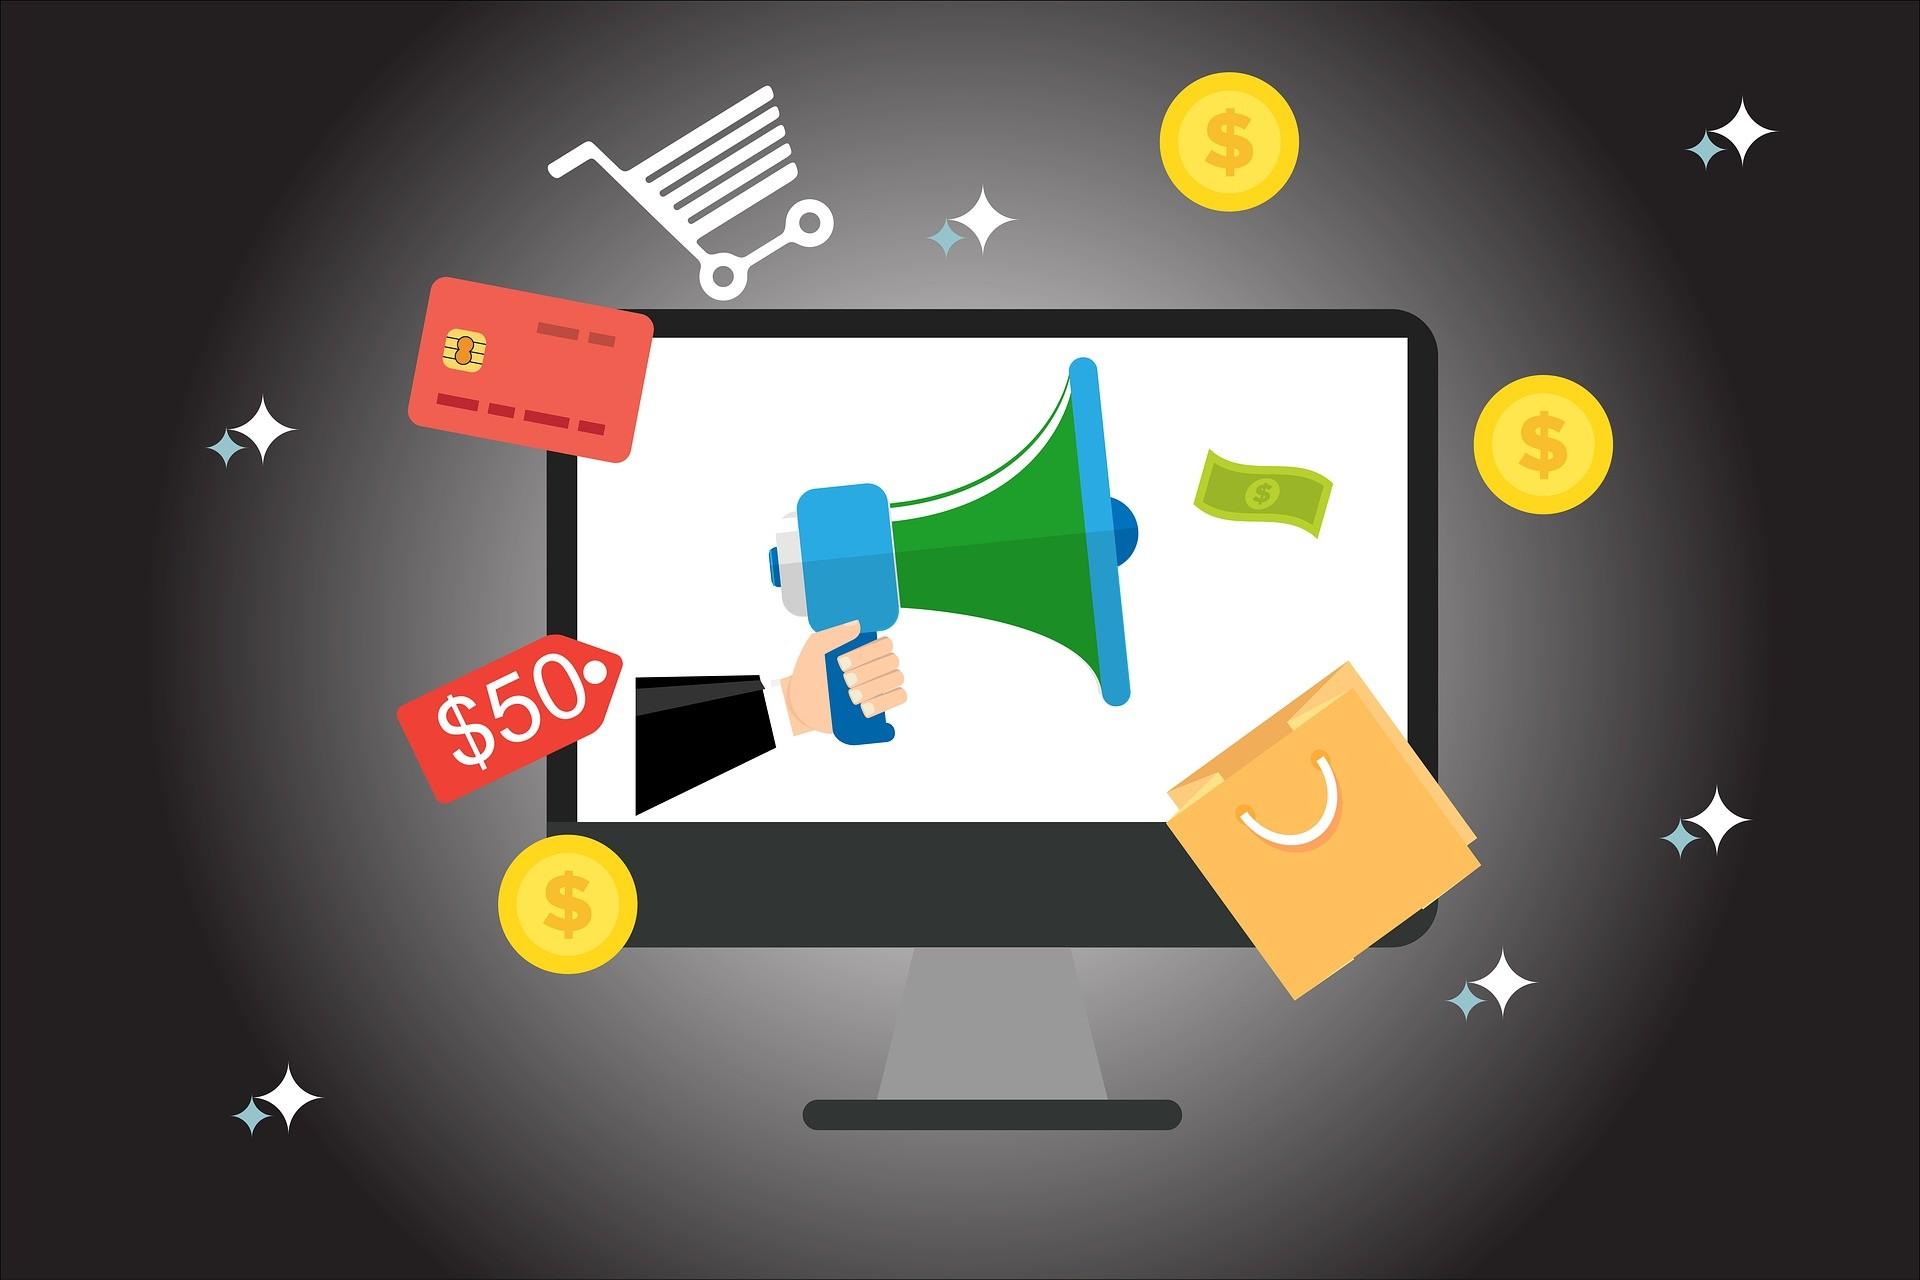 HappyWeb.ro | Web development | Online store | Web design, web development, online marketing